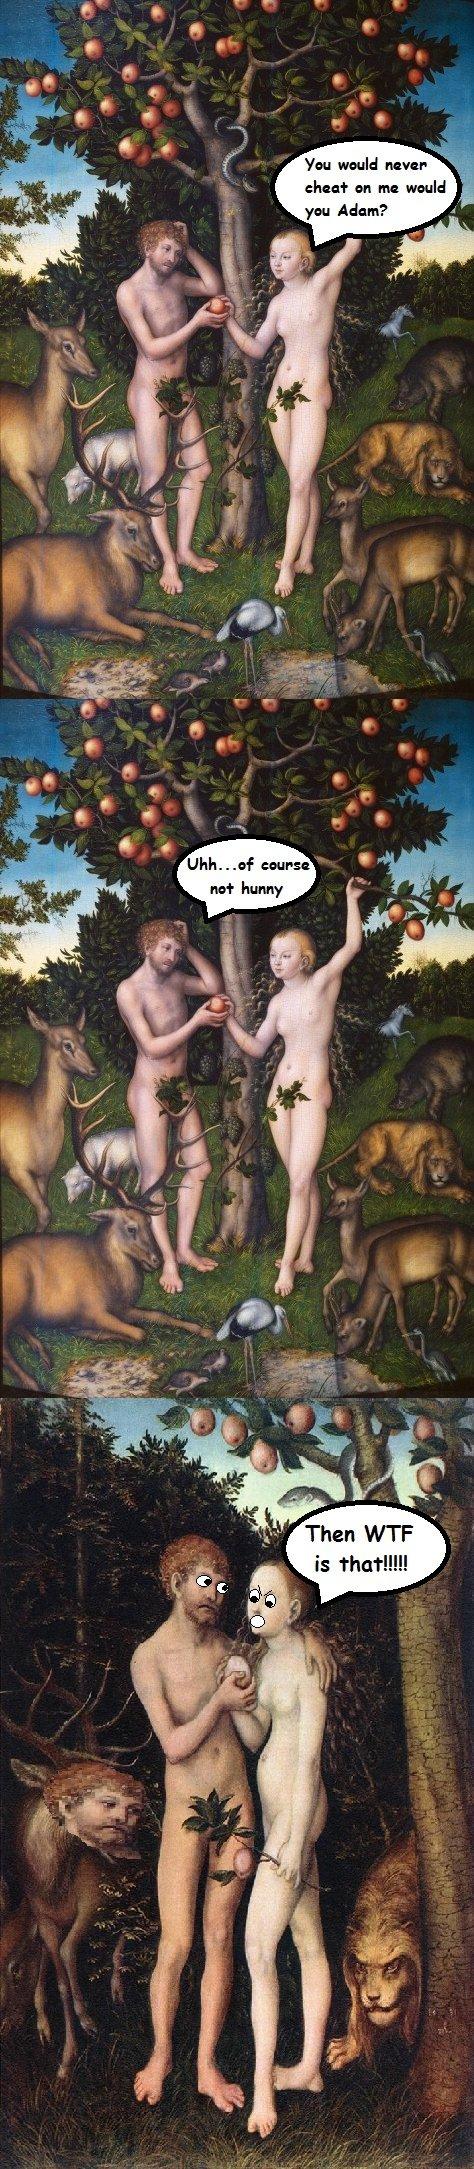 Adam and Eve. . YE 'Ware never ahead' an m: 18' ari gnu Adam? nu'? Huang;